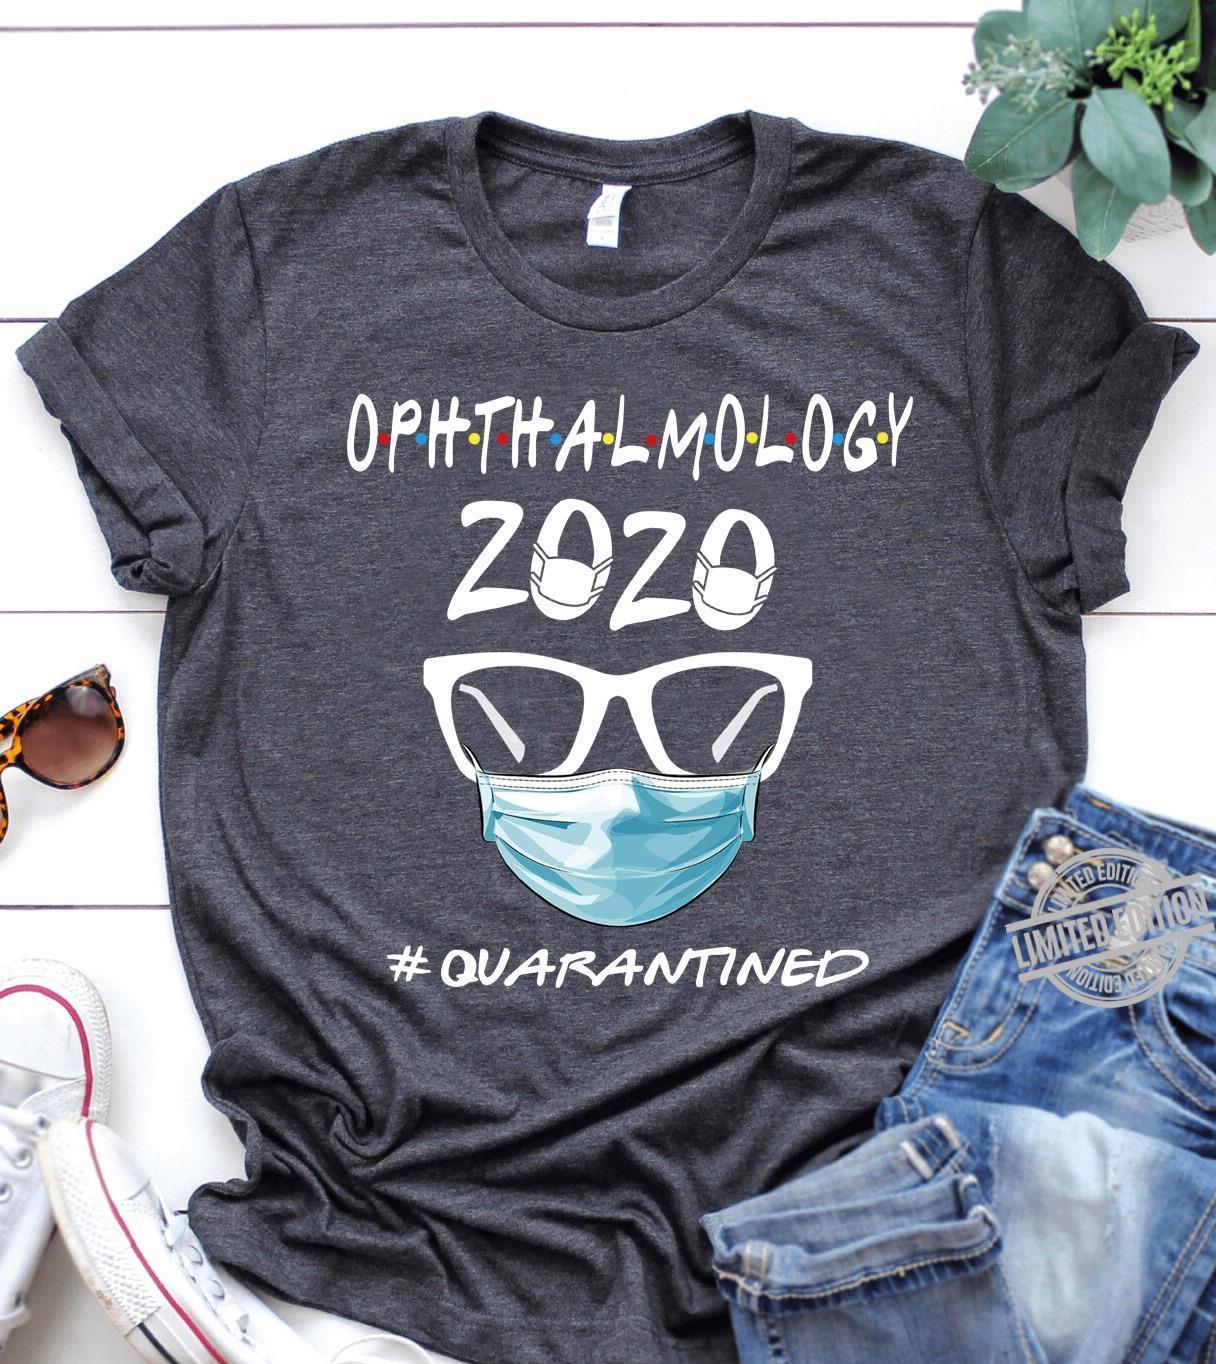 Ophthalmology 2020 Quarantined Shirt